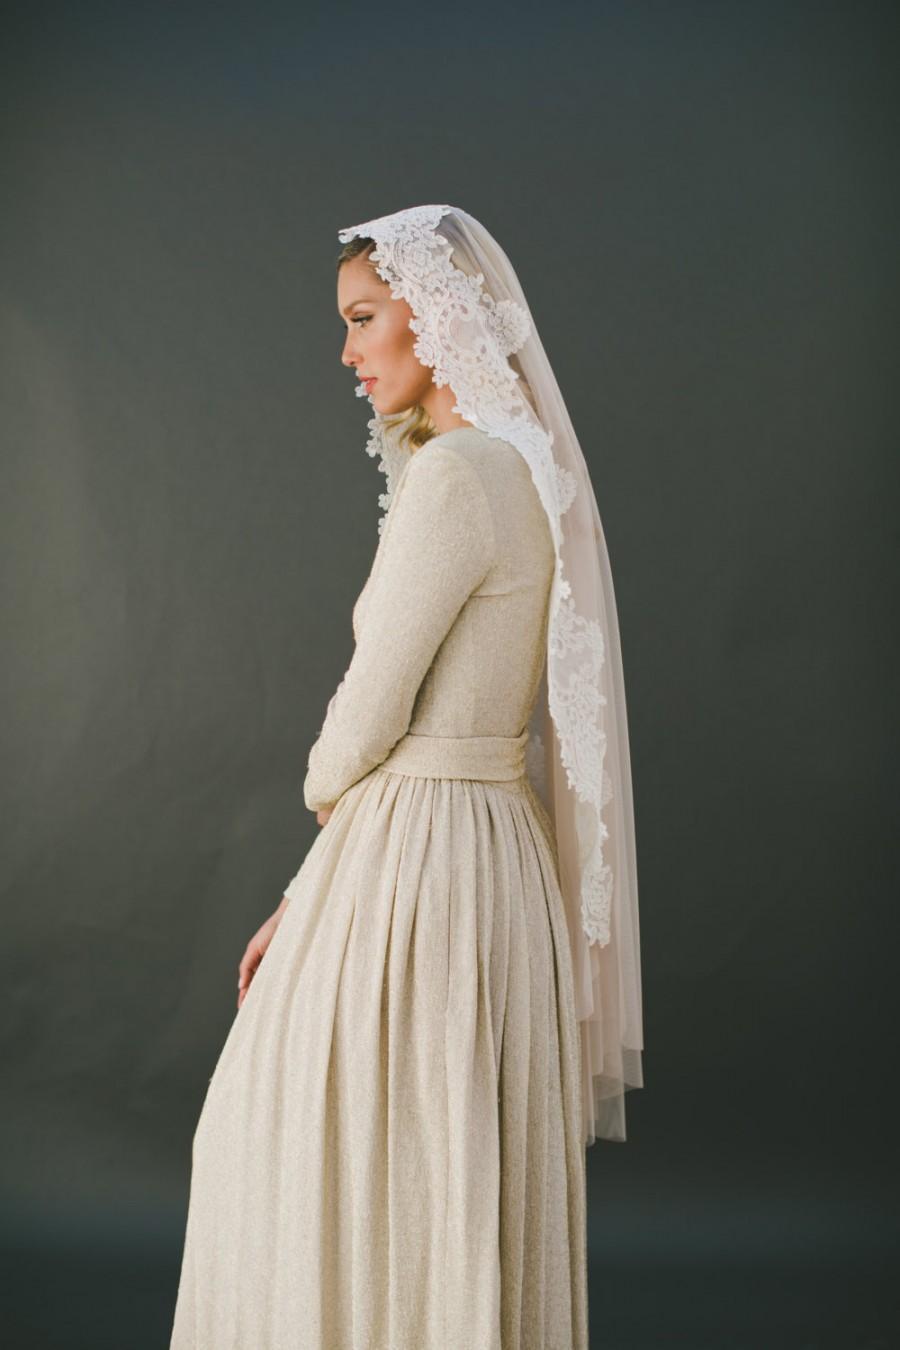 Mariage - Mantilla Veil, Mantilla Wedding Veil, Fingertip Lace Veil, English Net Veil, Soft Wedding Veil, Lace Bridal Veil, Partial Lace Veil 1574